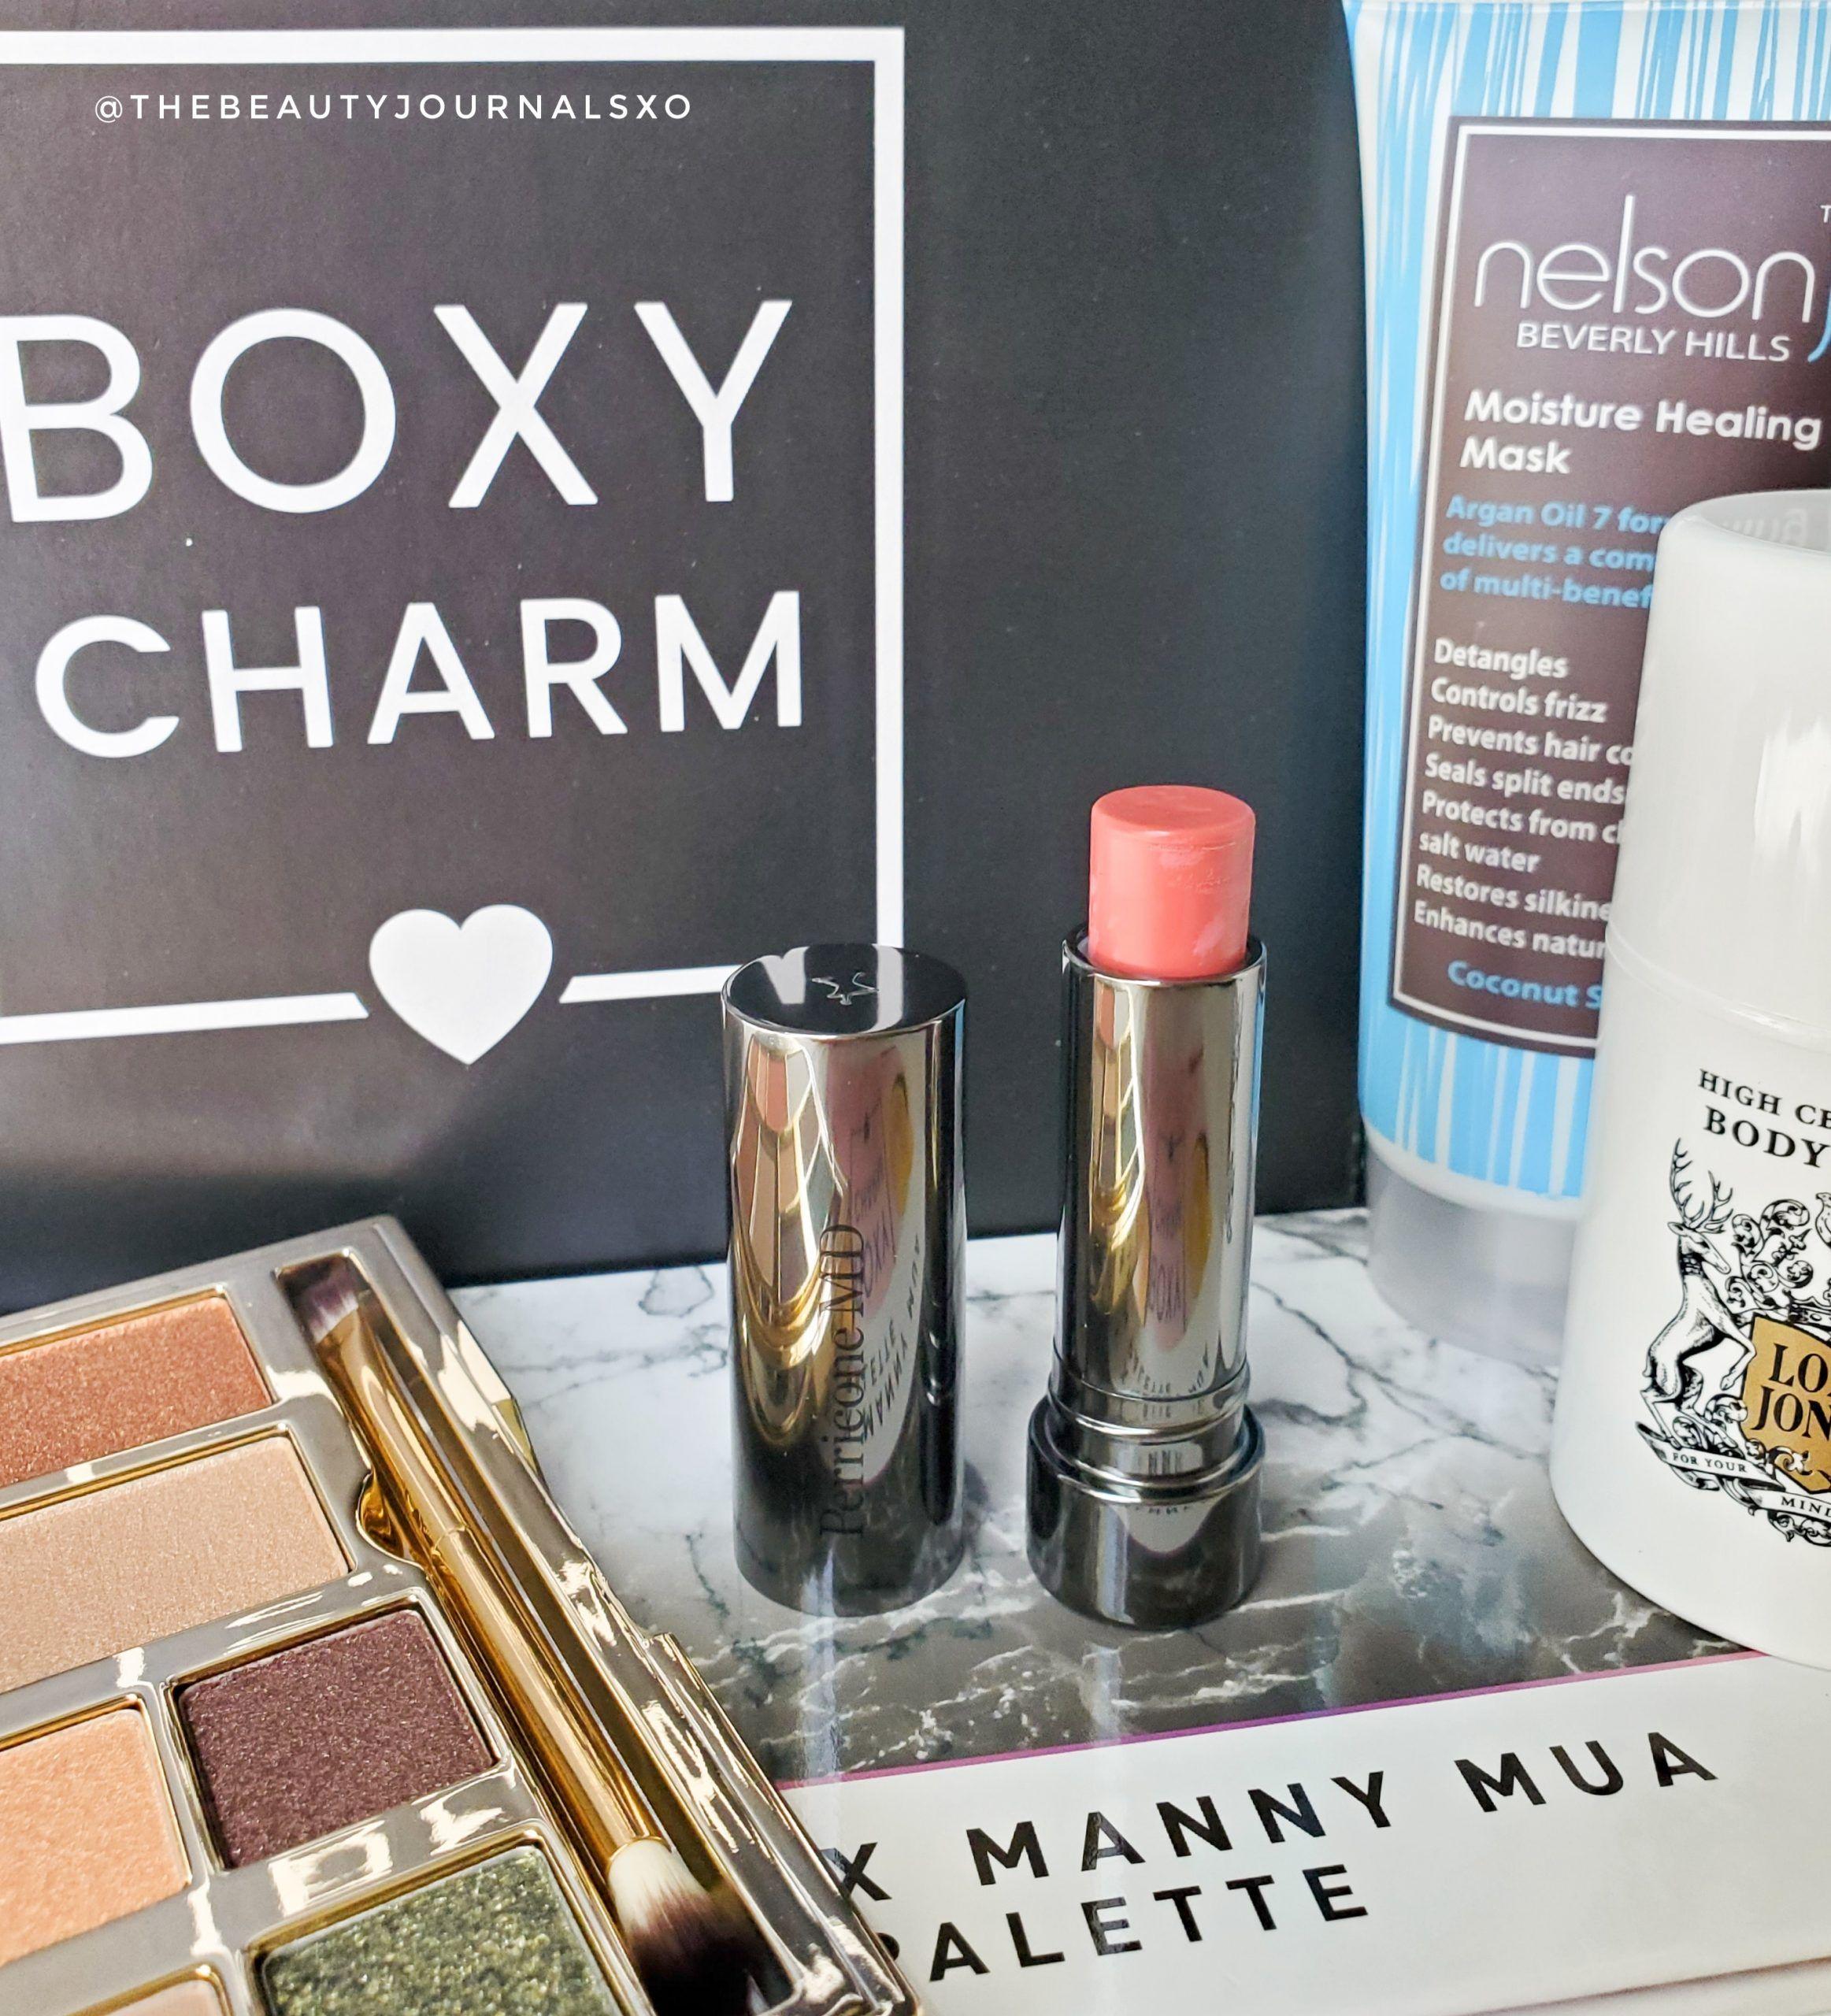 Perricone MD No Makeup Lipstick Boxycharm Premium July